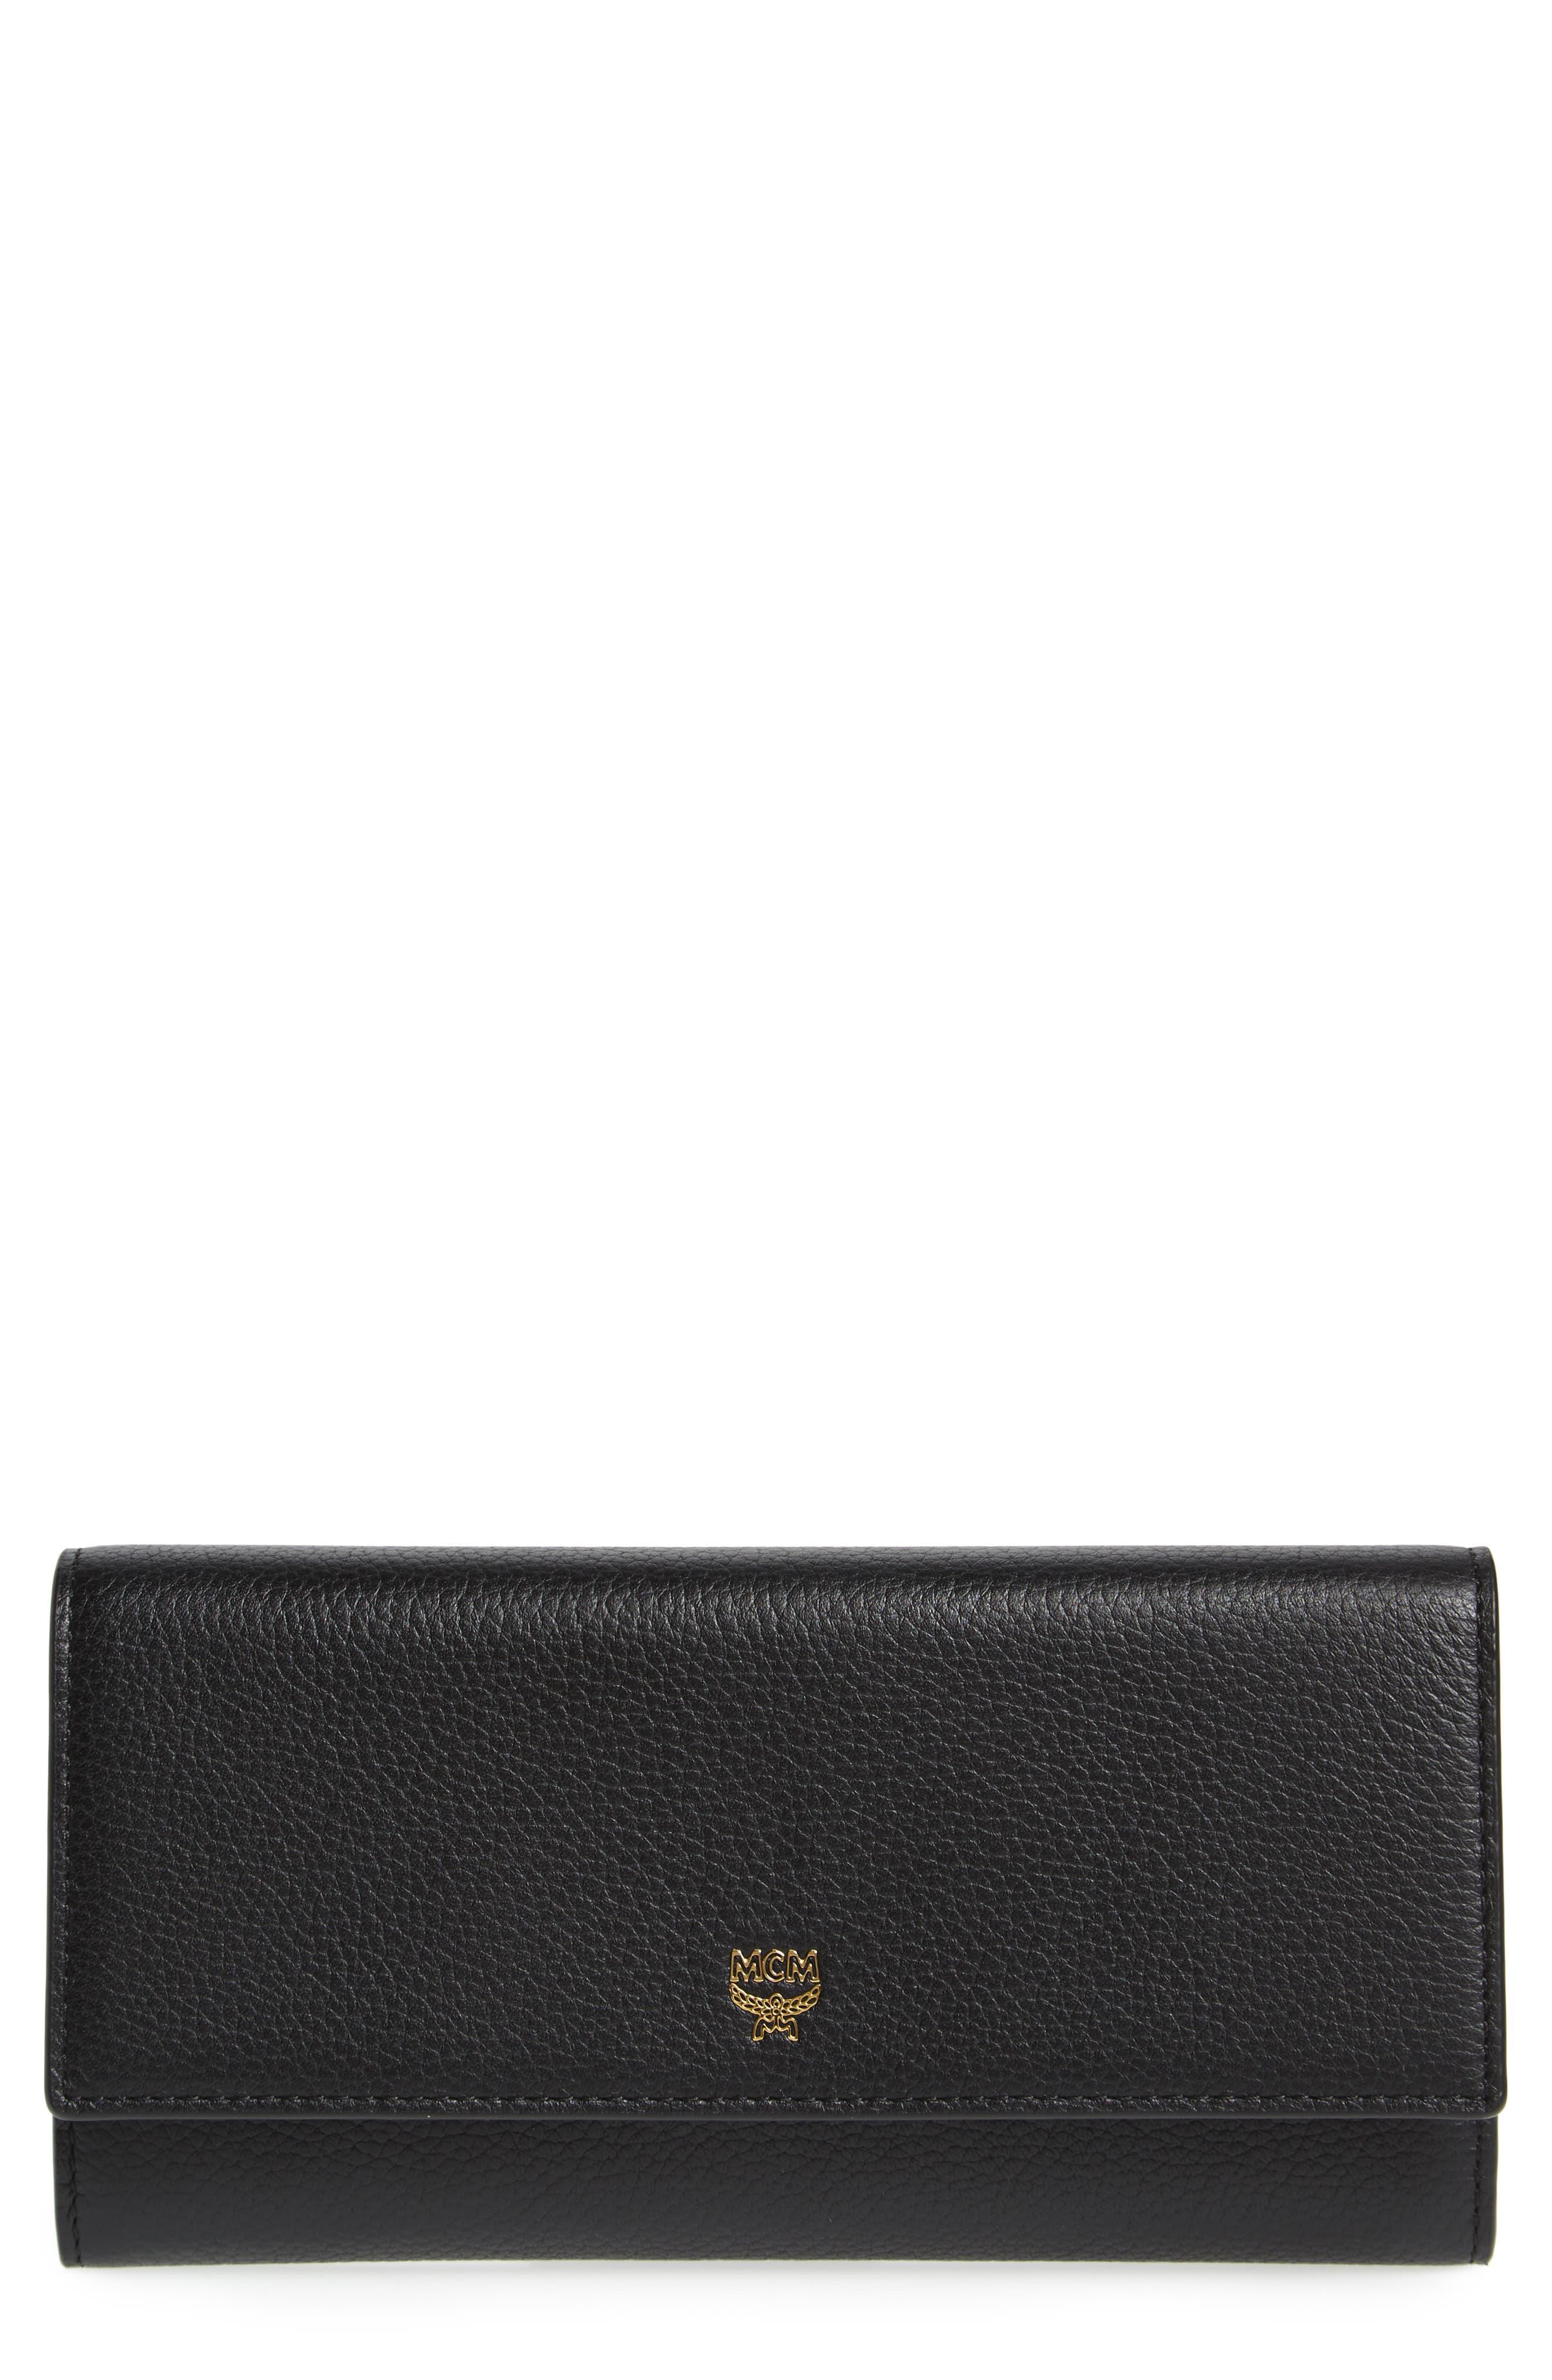 MCM Milla Three-Fold Leather Wallet